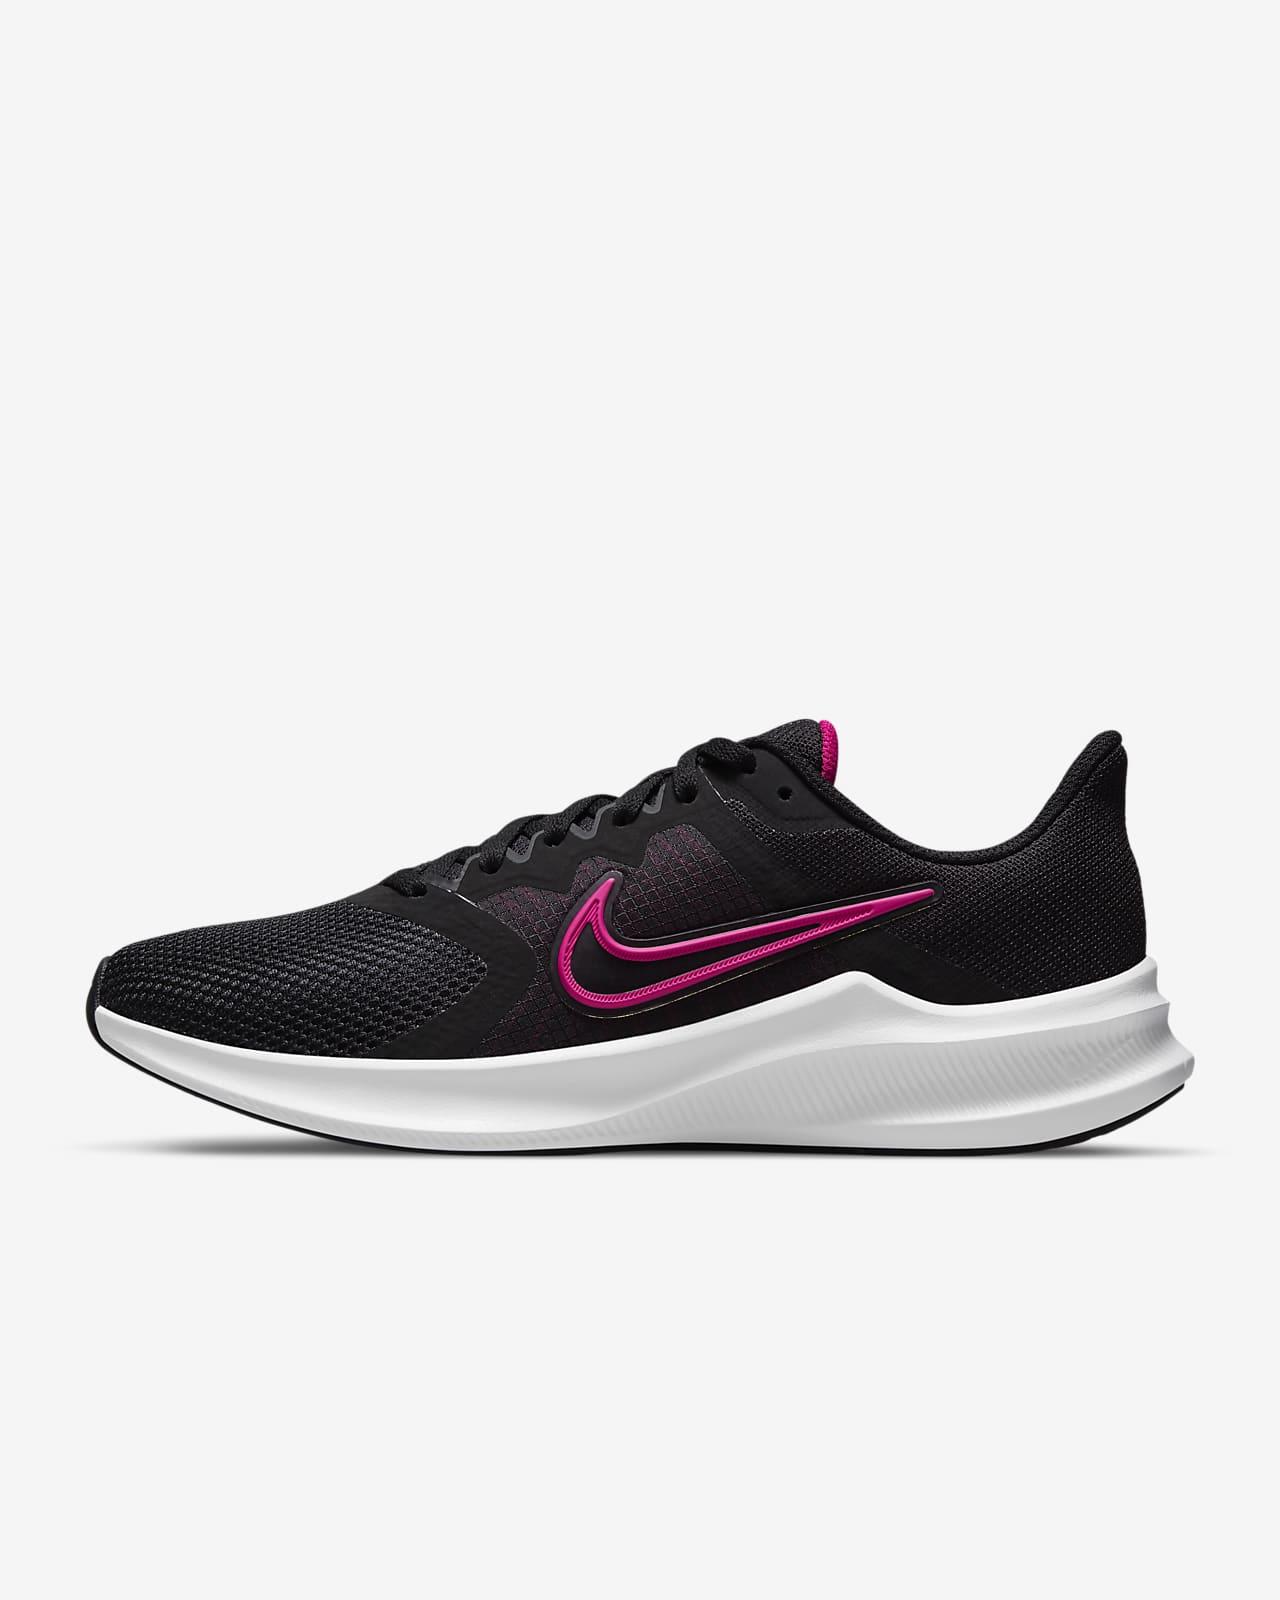 Calzado de running para mujer Nike Downshifter 11